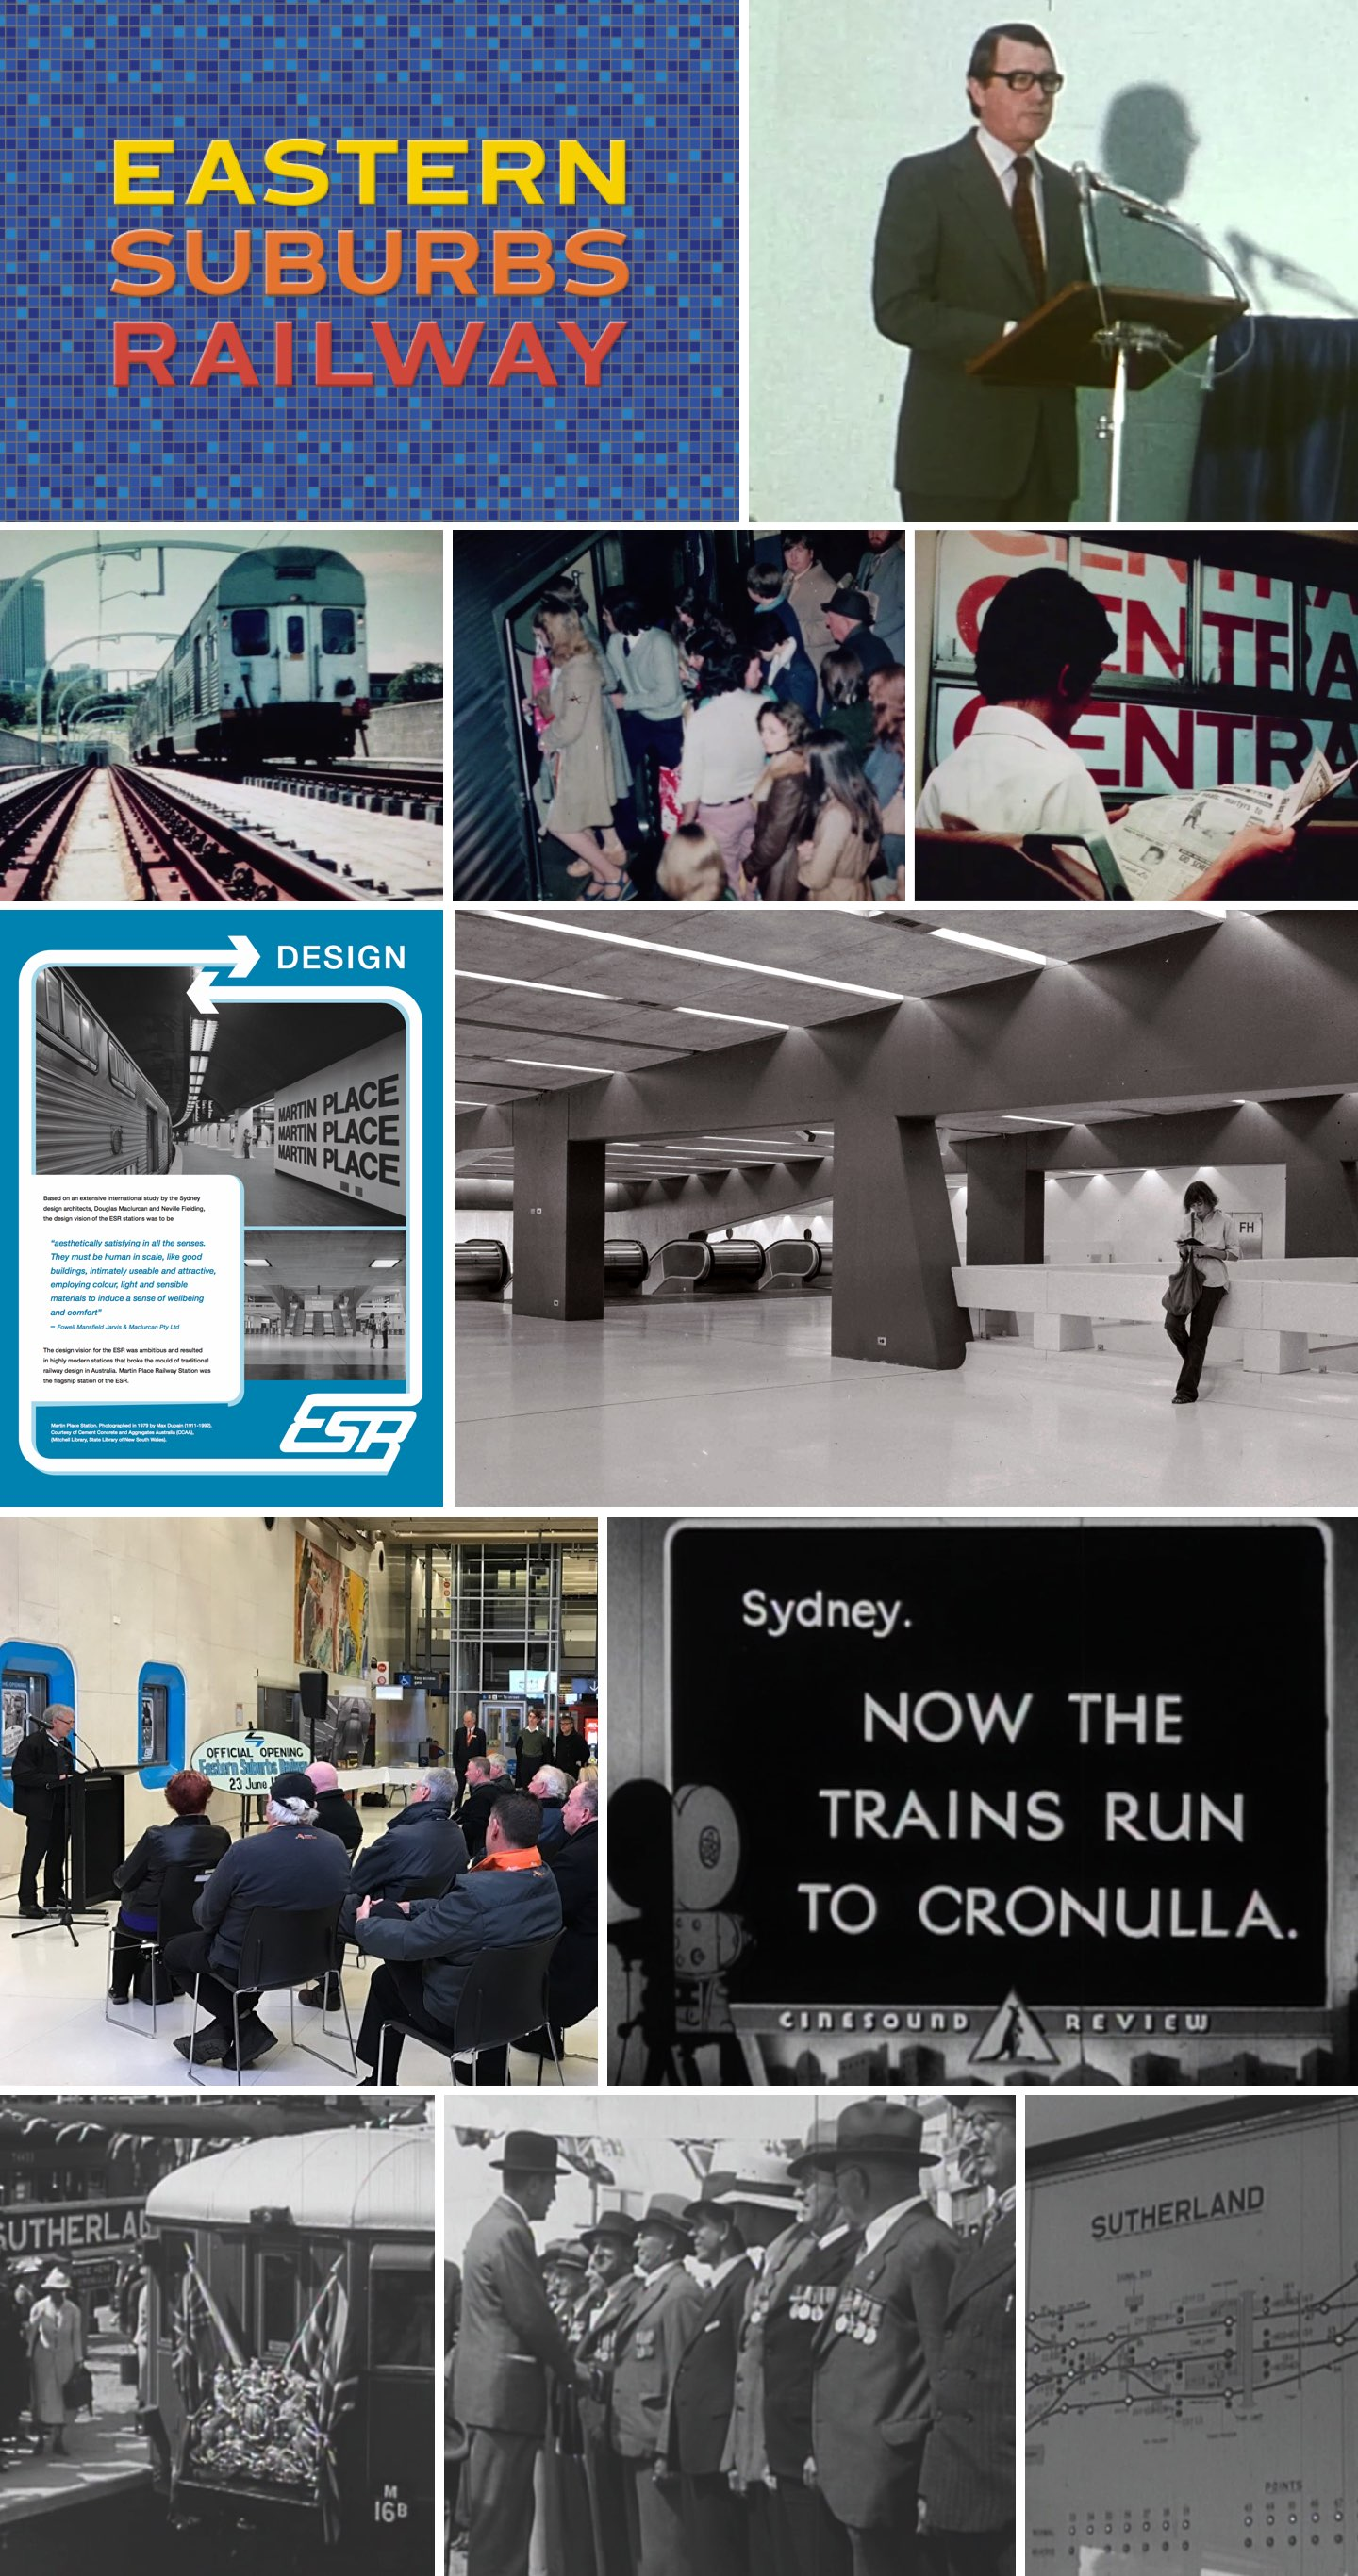 Eastern Suburbs Railway Celebration